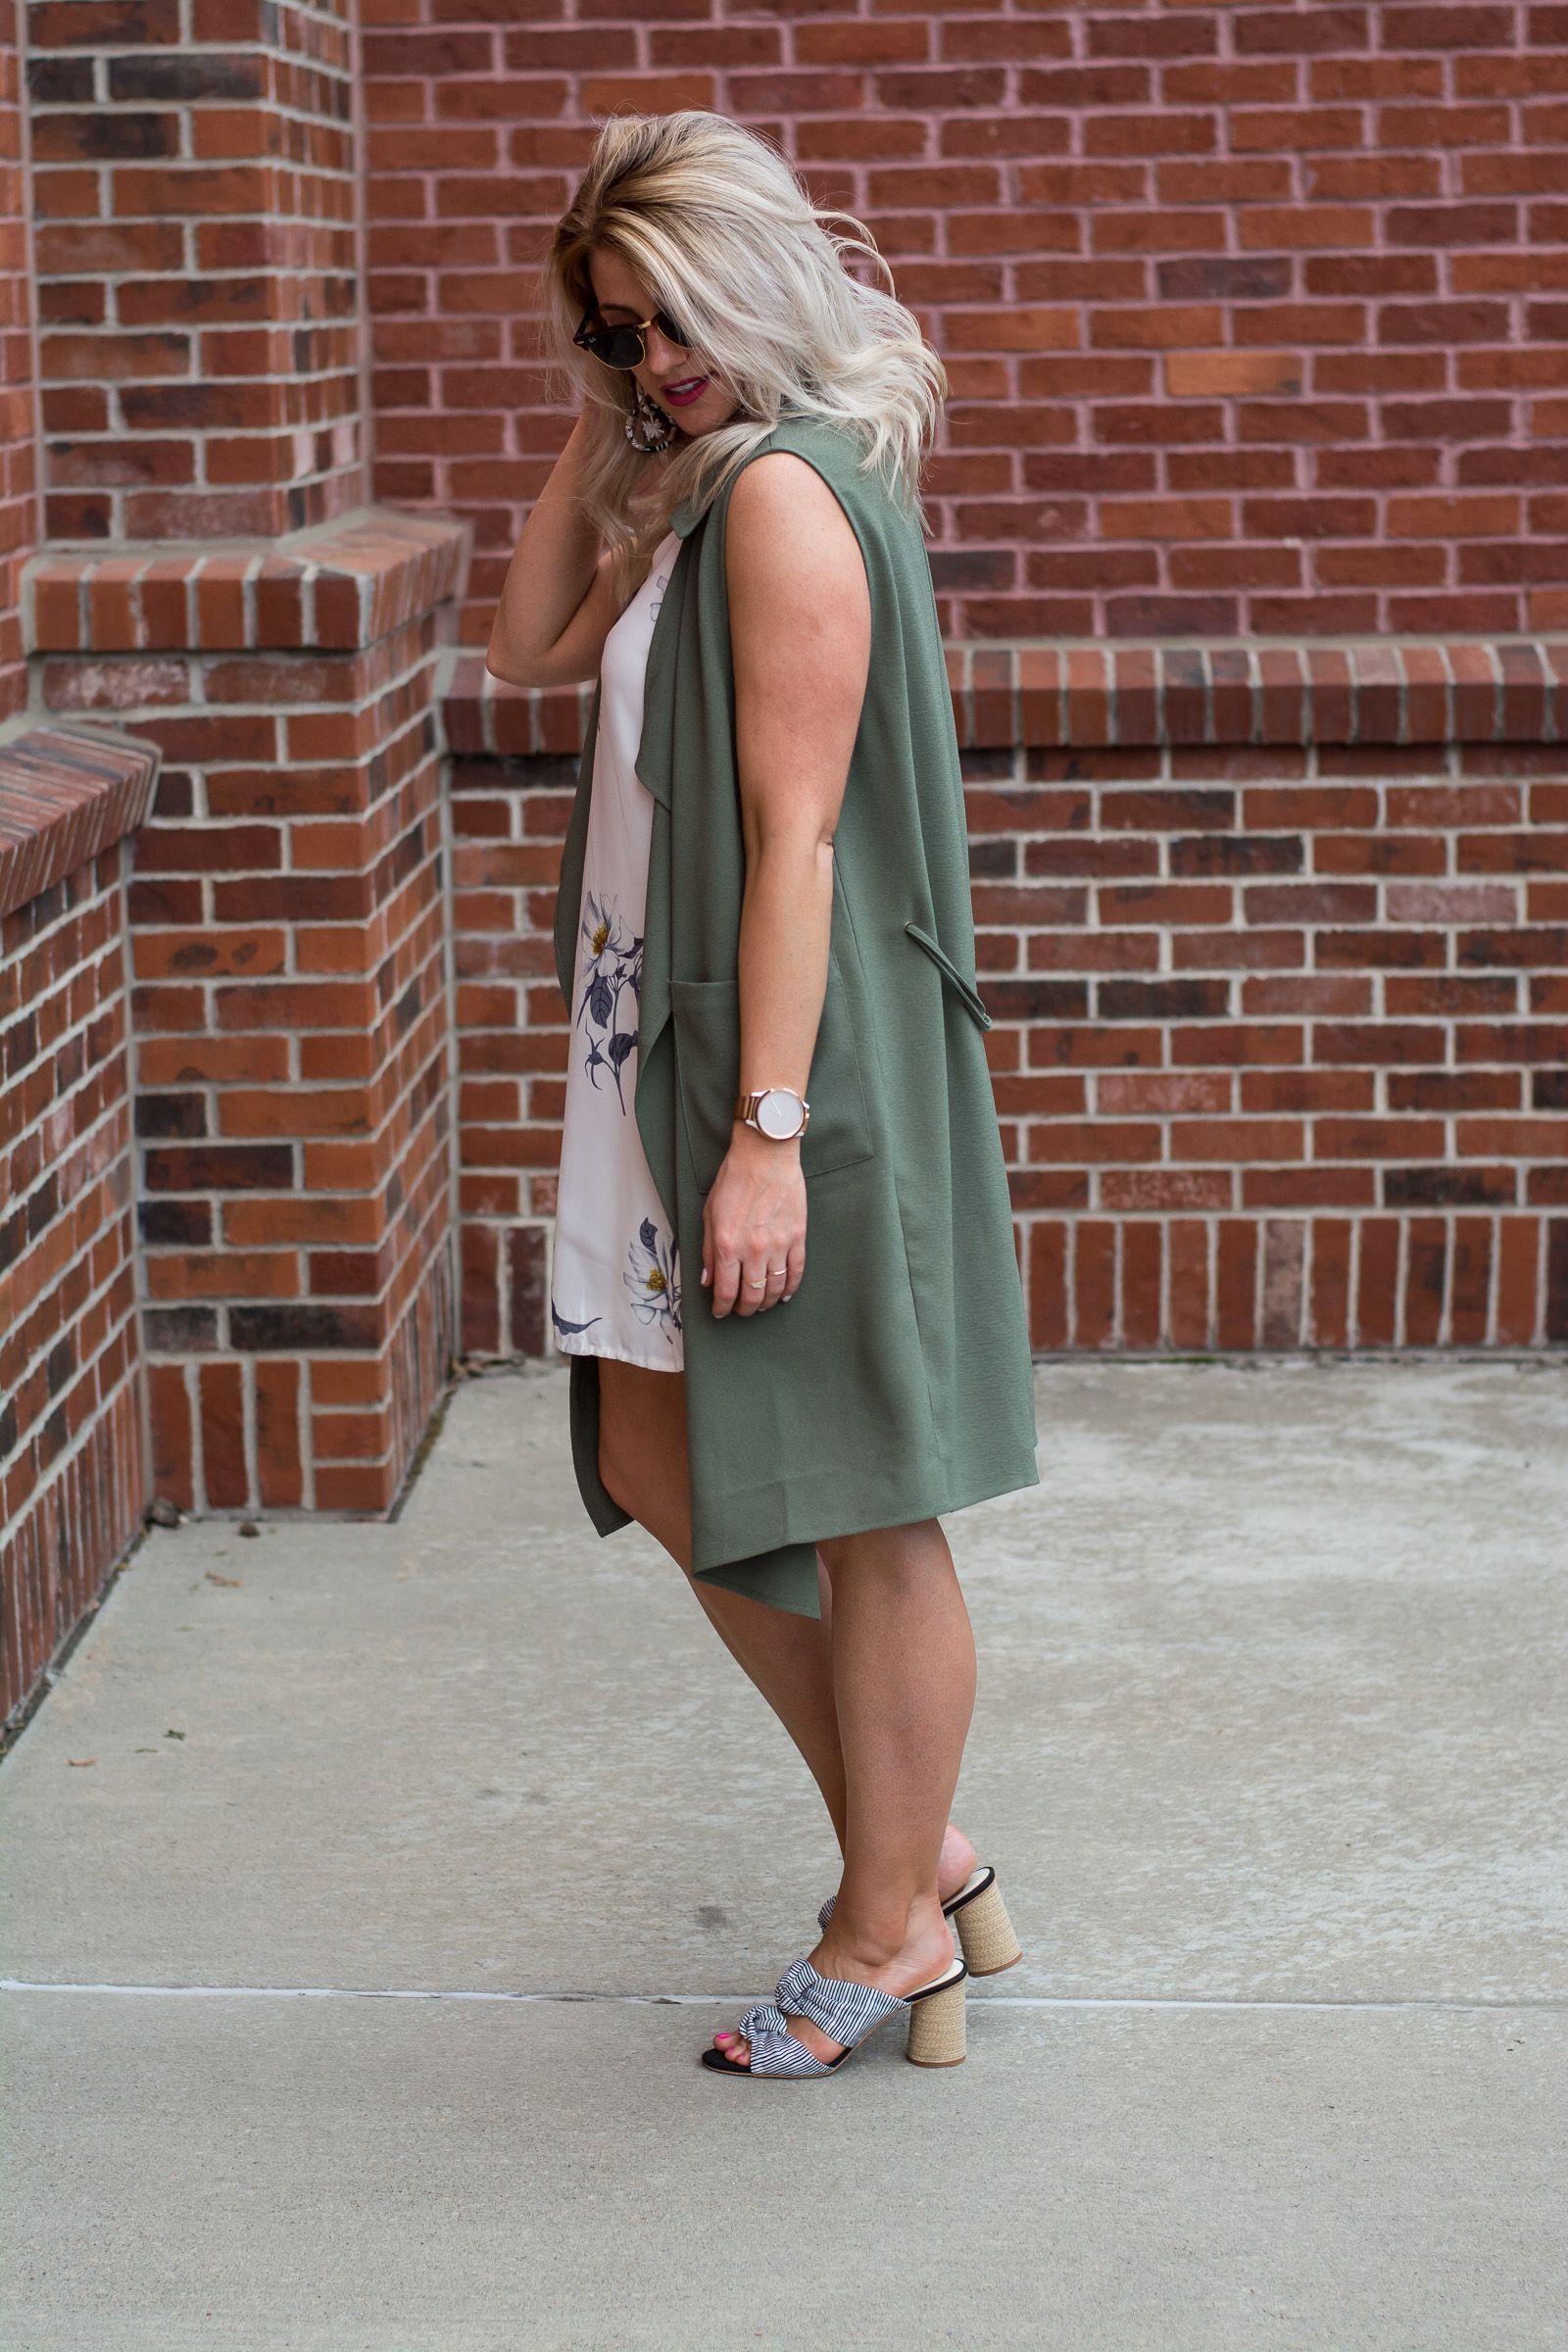 e390c0f06d Outfit Idea  Olive Green Vest + Striped Sandals.